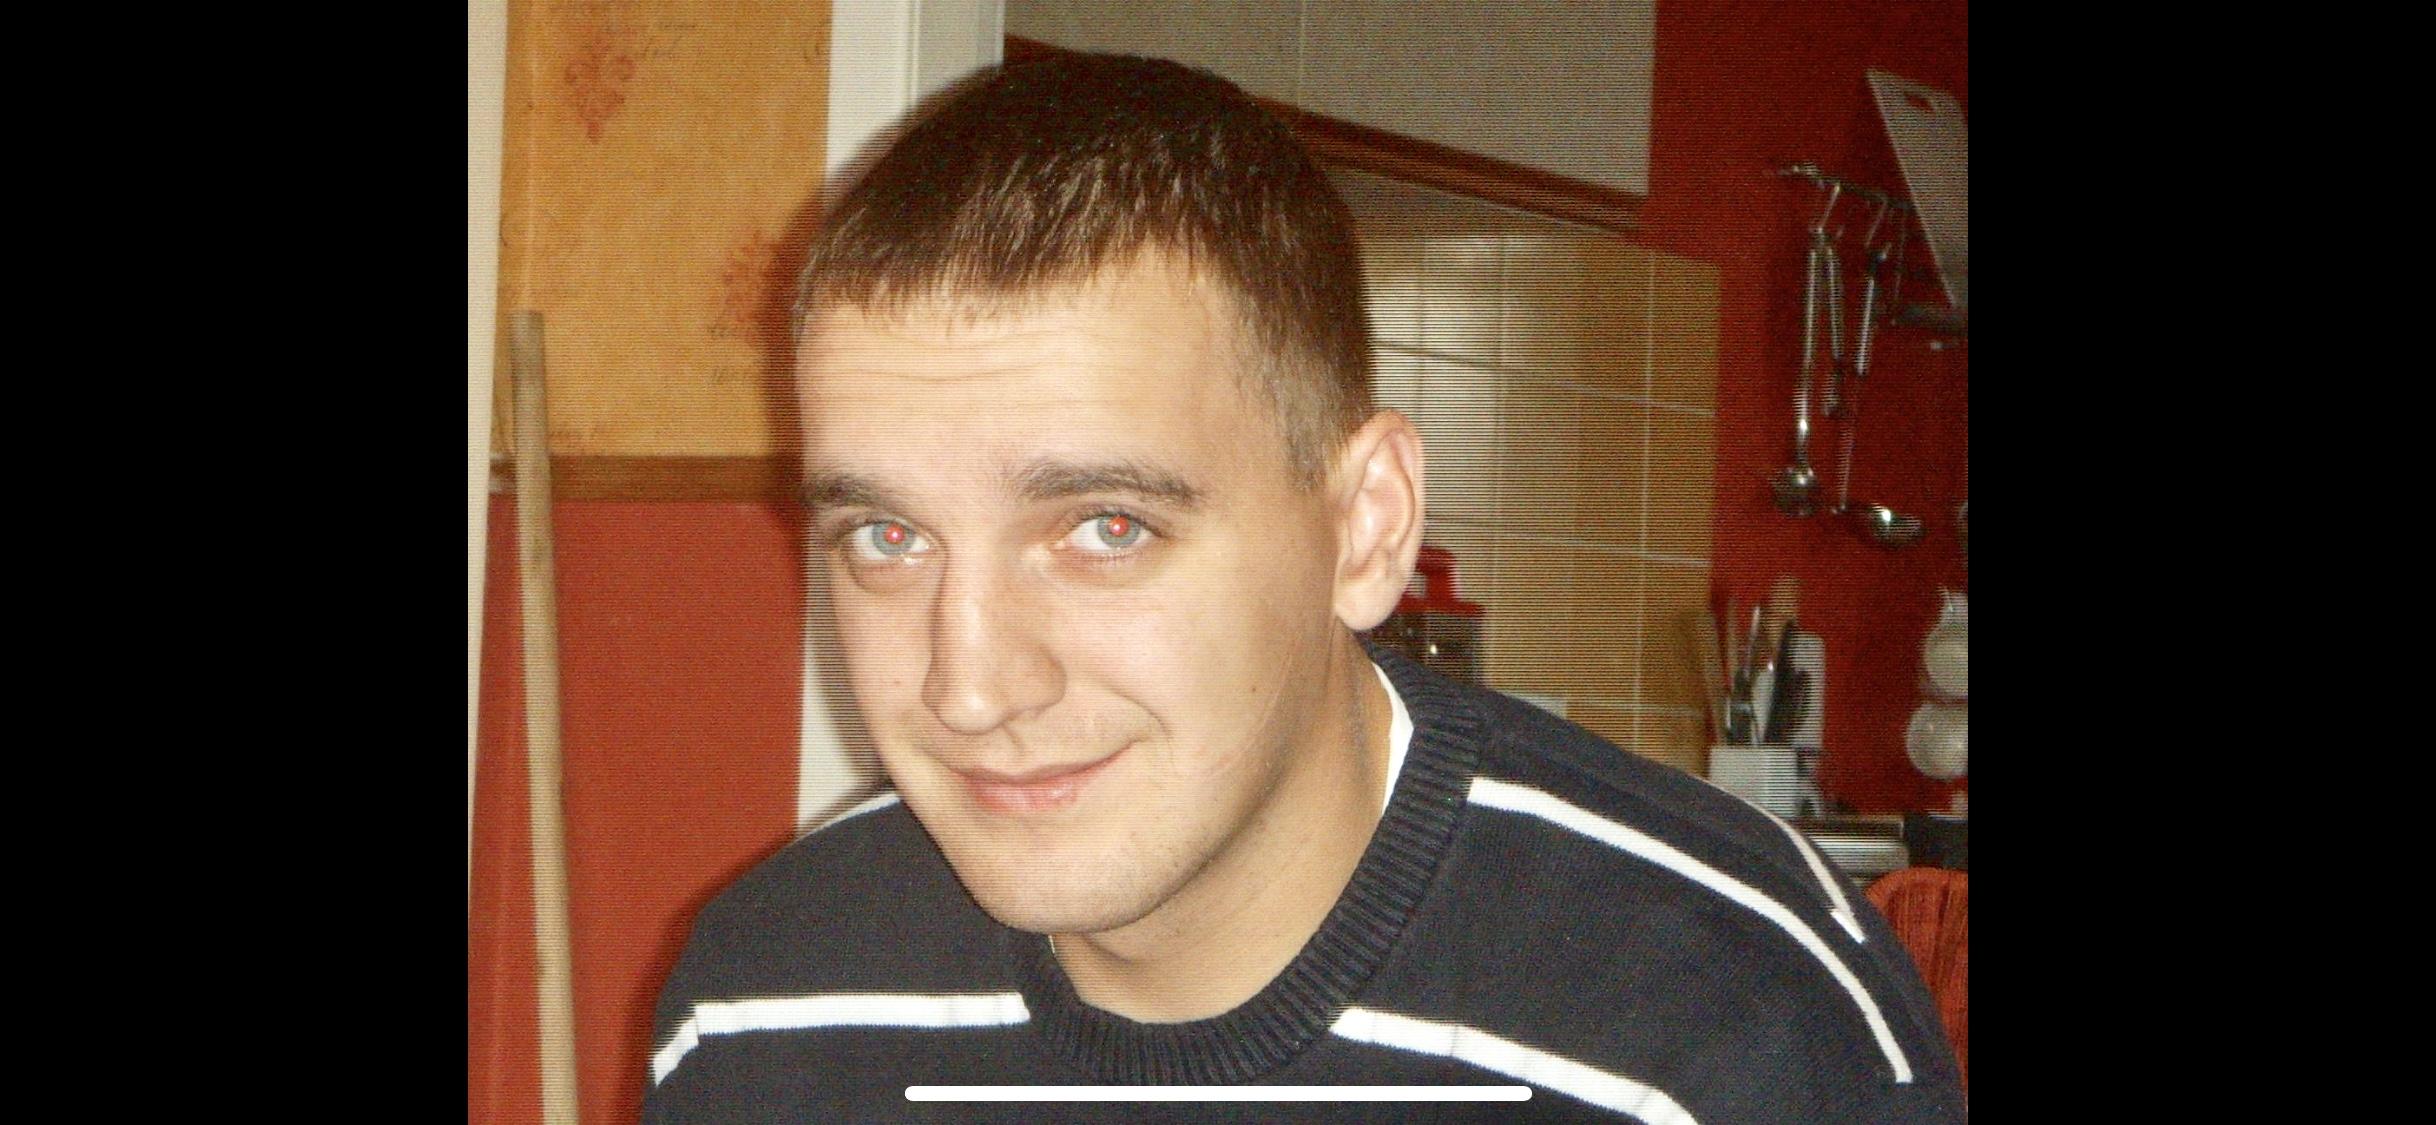 Paul Fairweather was found dead at the scene.